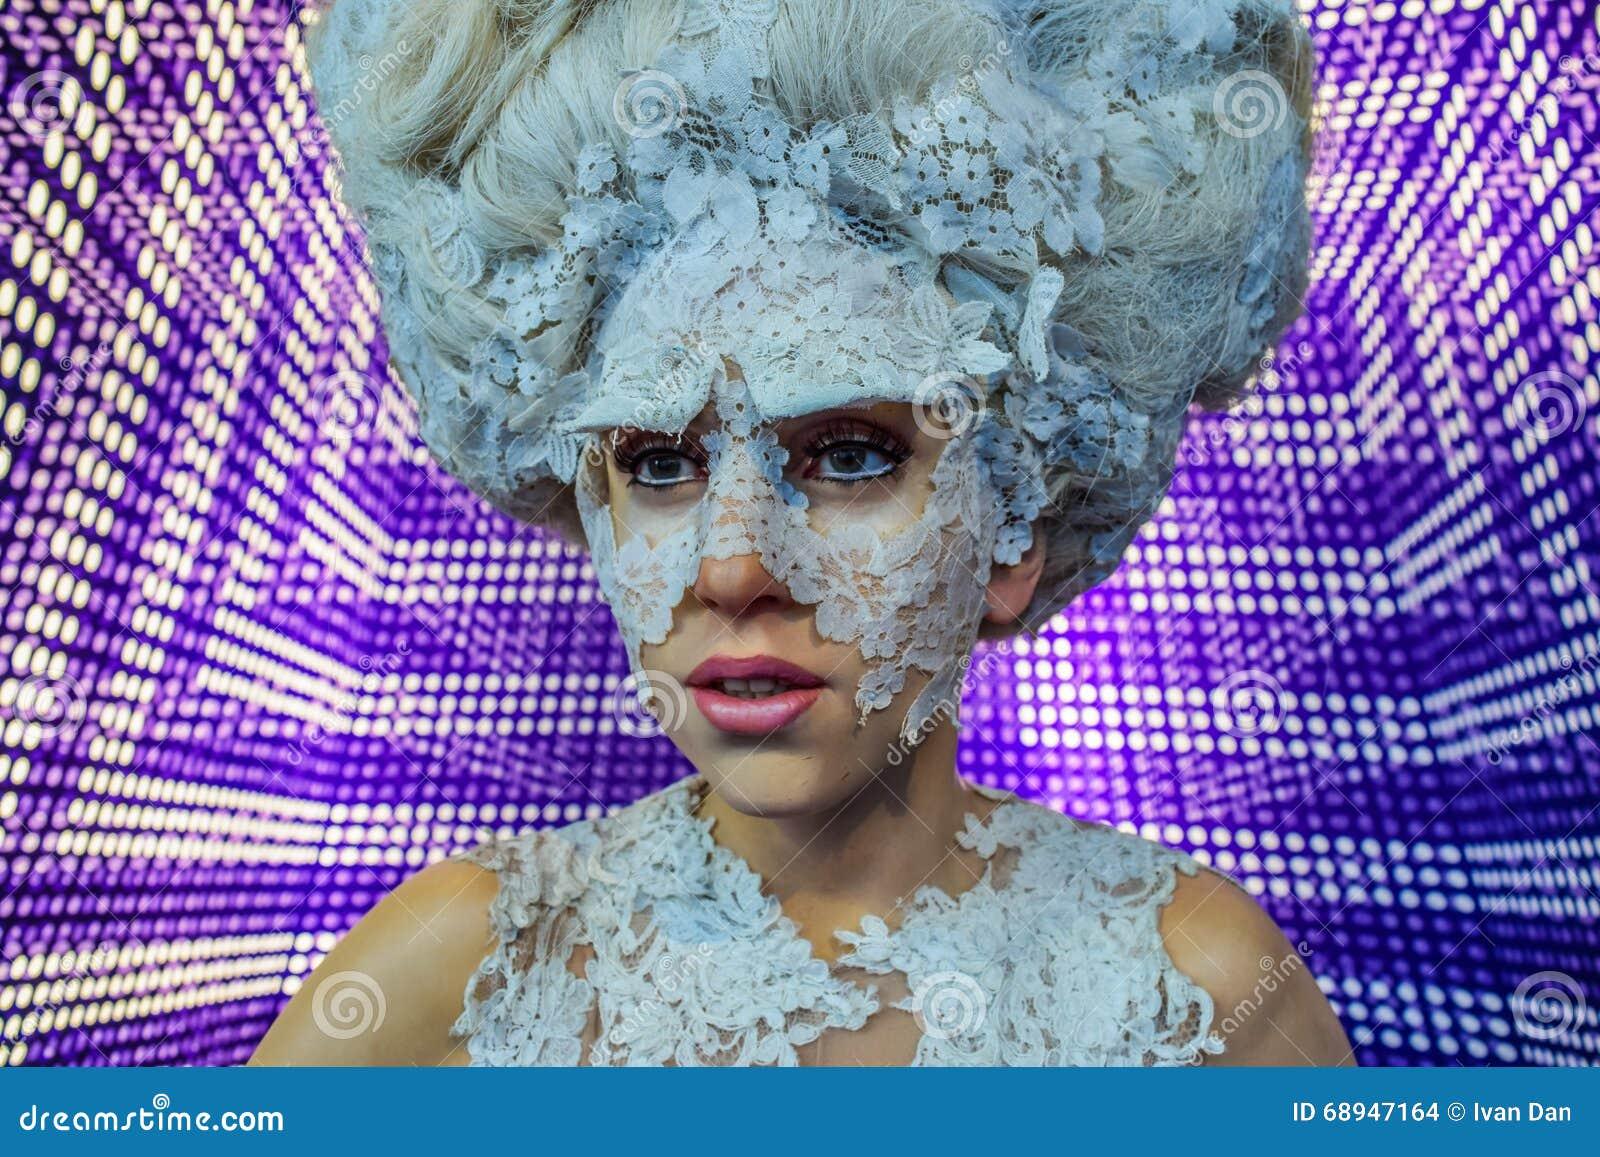 Signora Gaga, figura di cera Stefani Joanne Angelina Germanotta